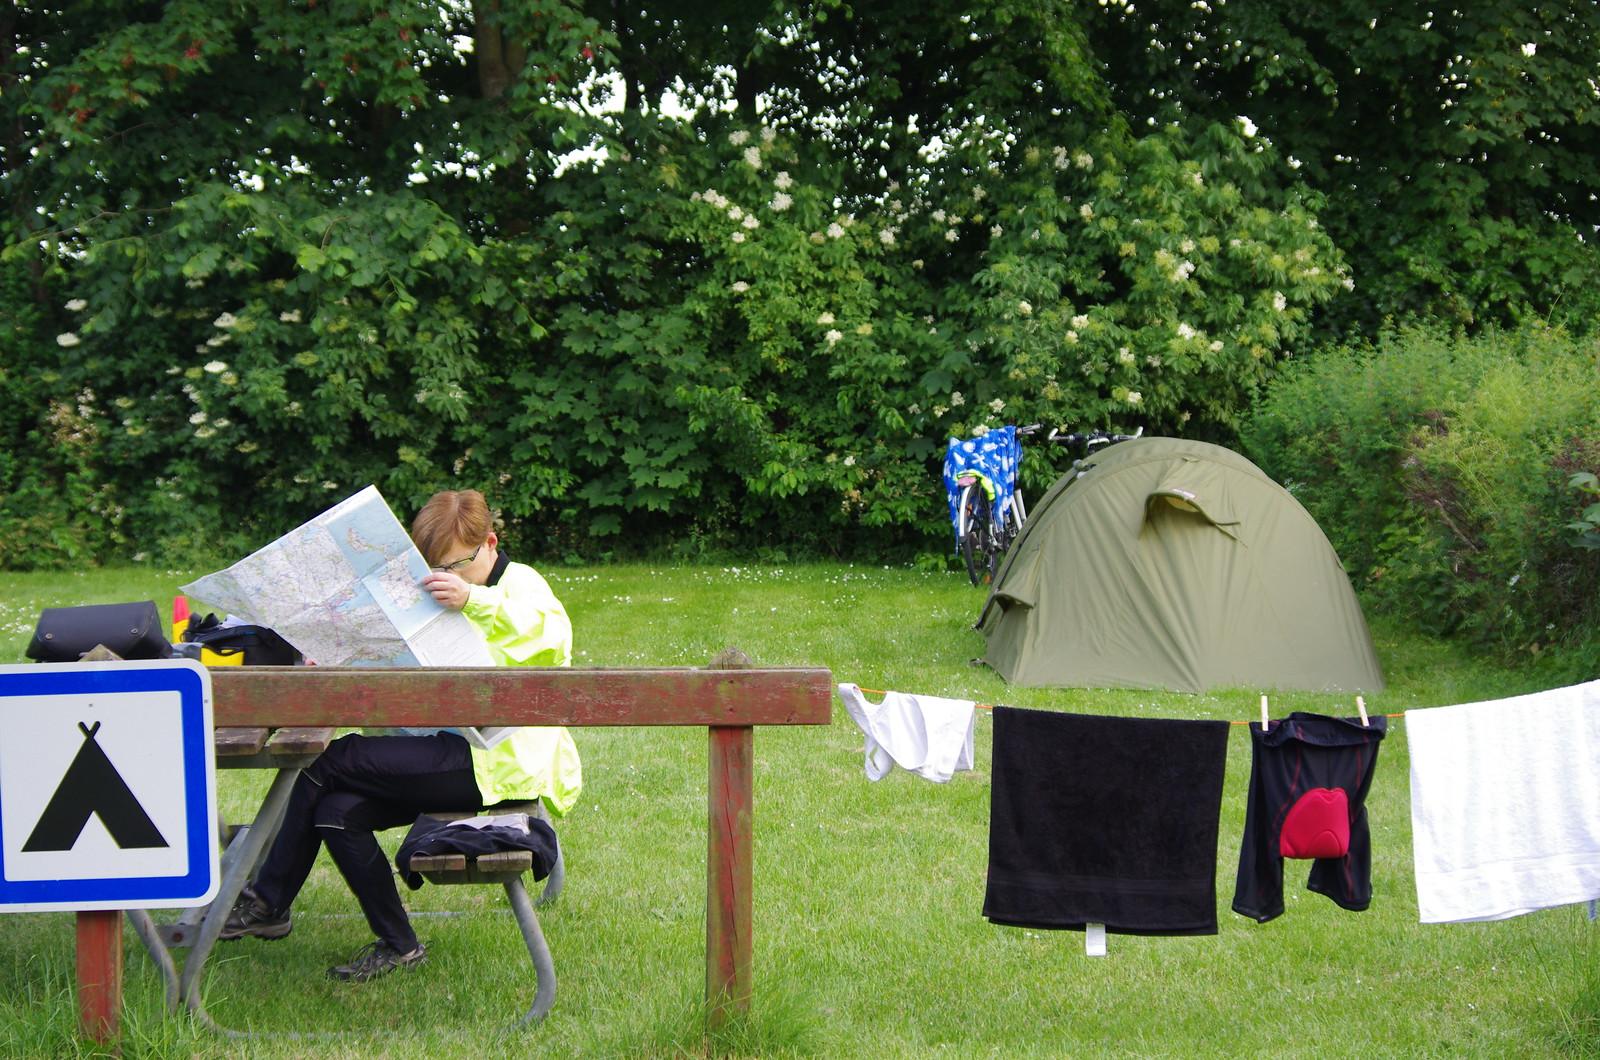 Hadsund Camping og Vandrehjem